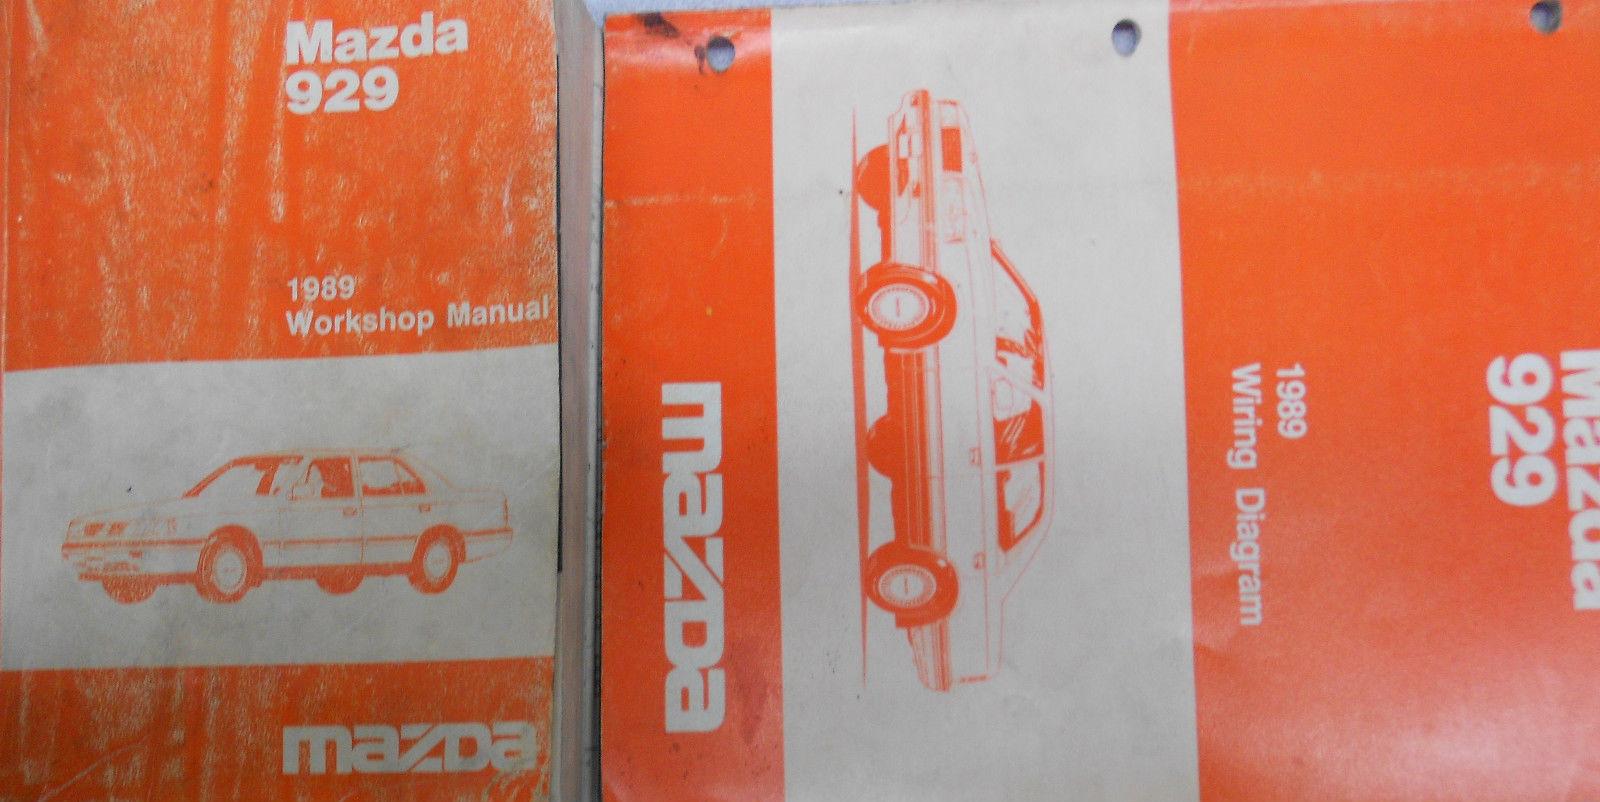 mazda manual (1980s) 71 listings